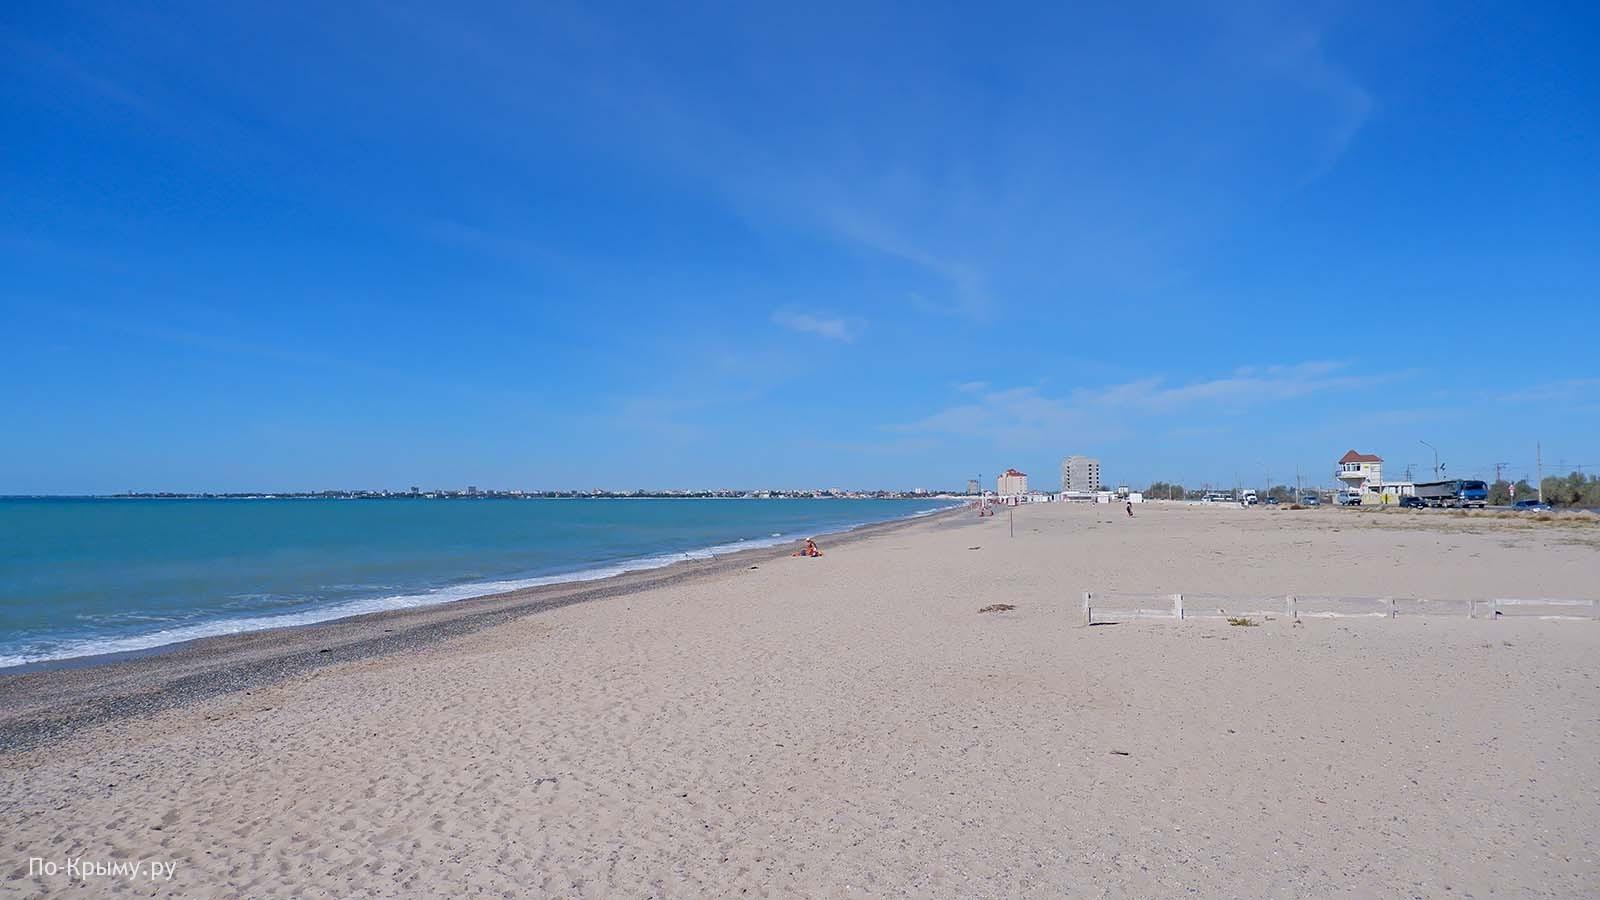 Пляж в аренде ИП Хулапа